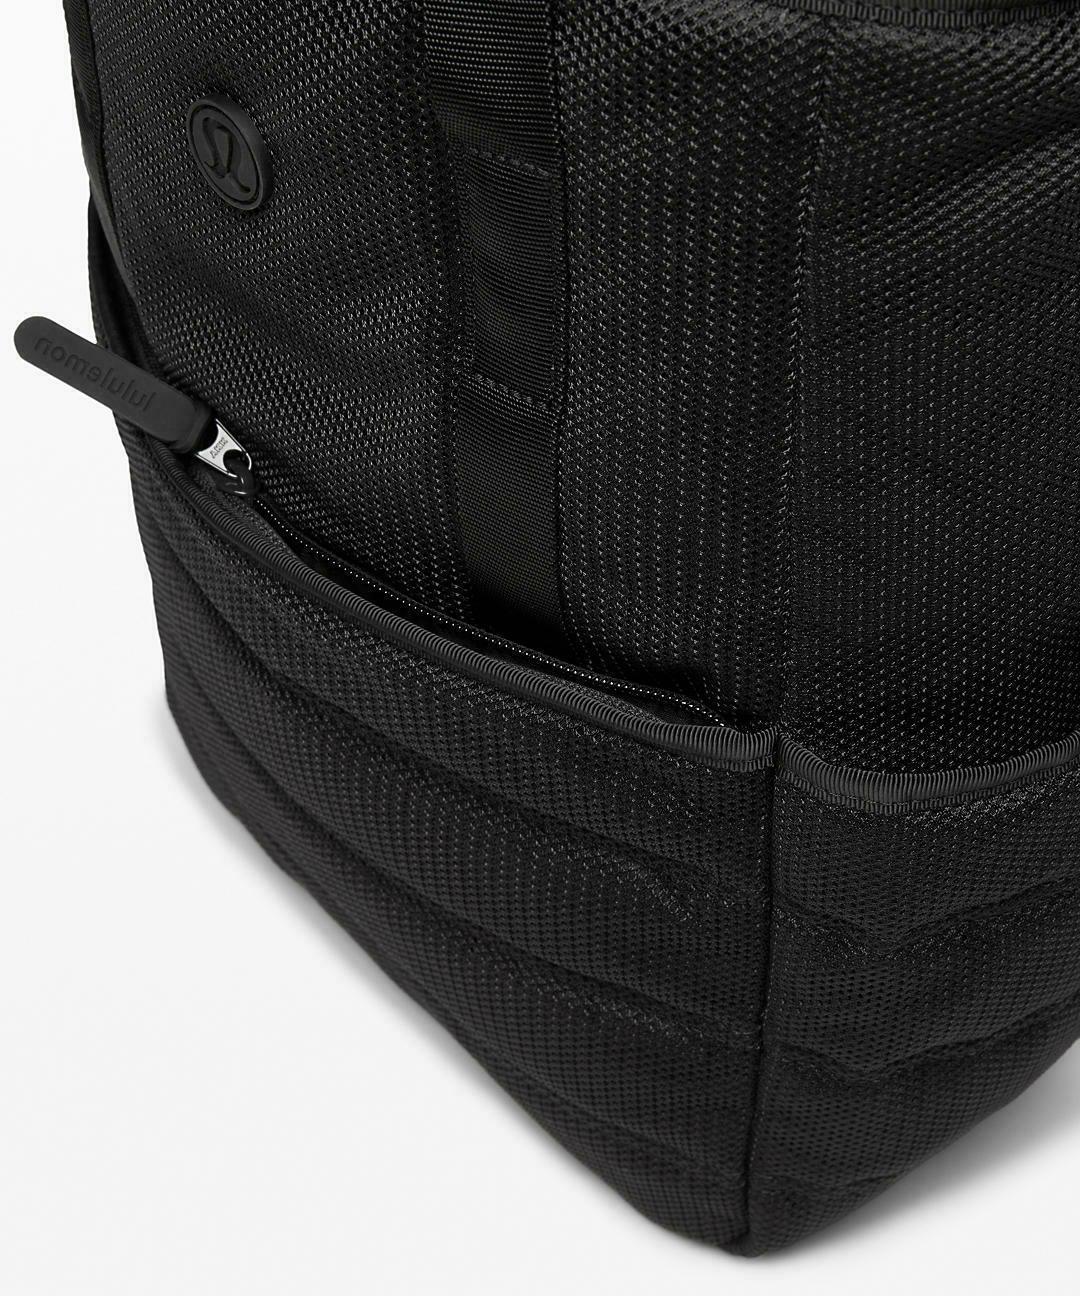 NWT Lululemon Dash Day Bag Backpack 17L Black handle tote